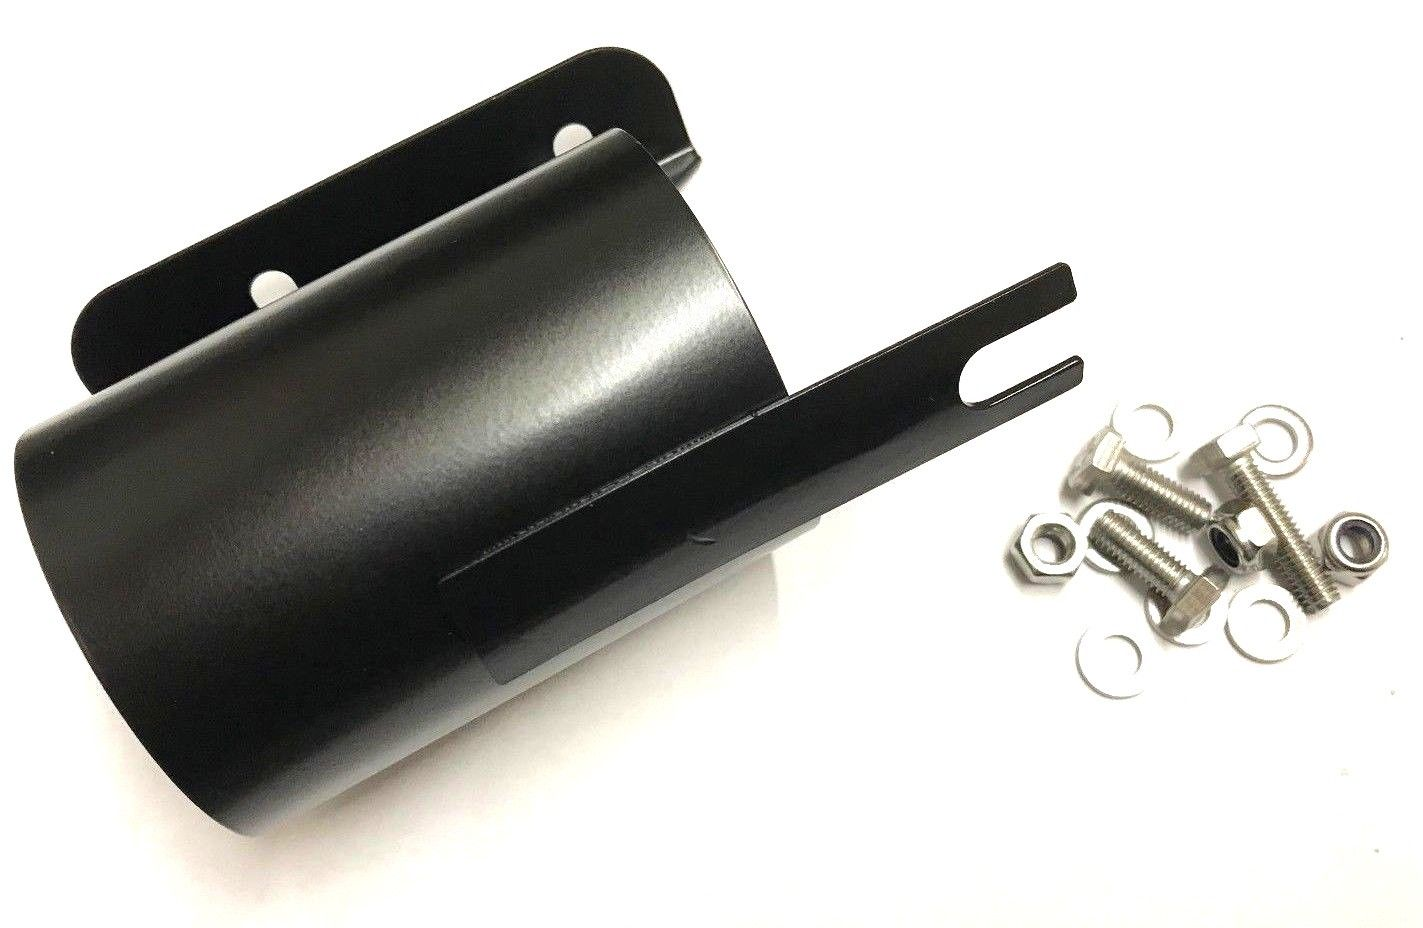 Classic Mini Spi Mpi Fuel Filter Bracket Wju10142 Rover Cooper Injection 7b10